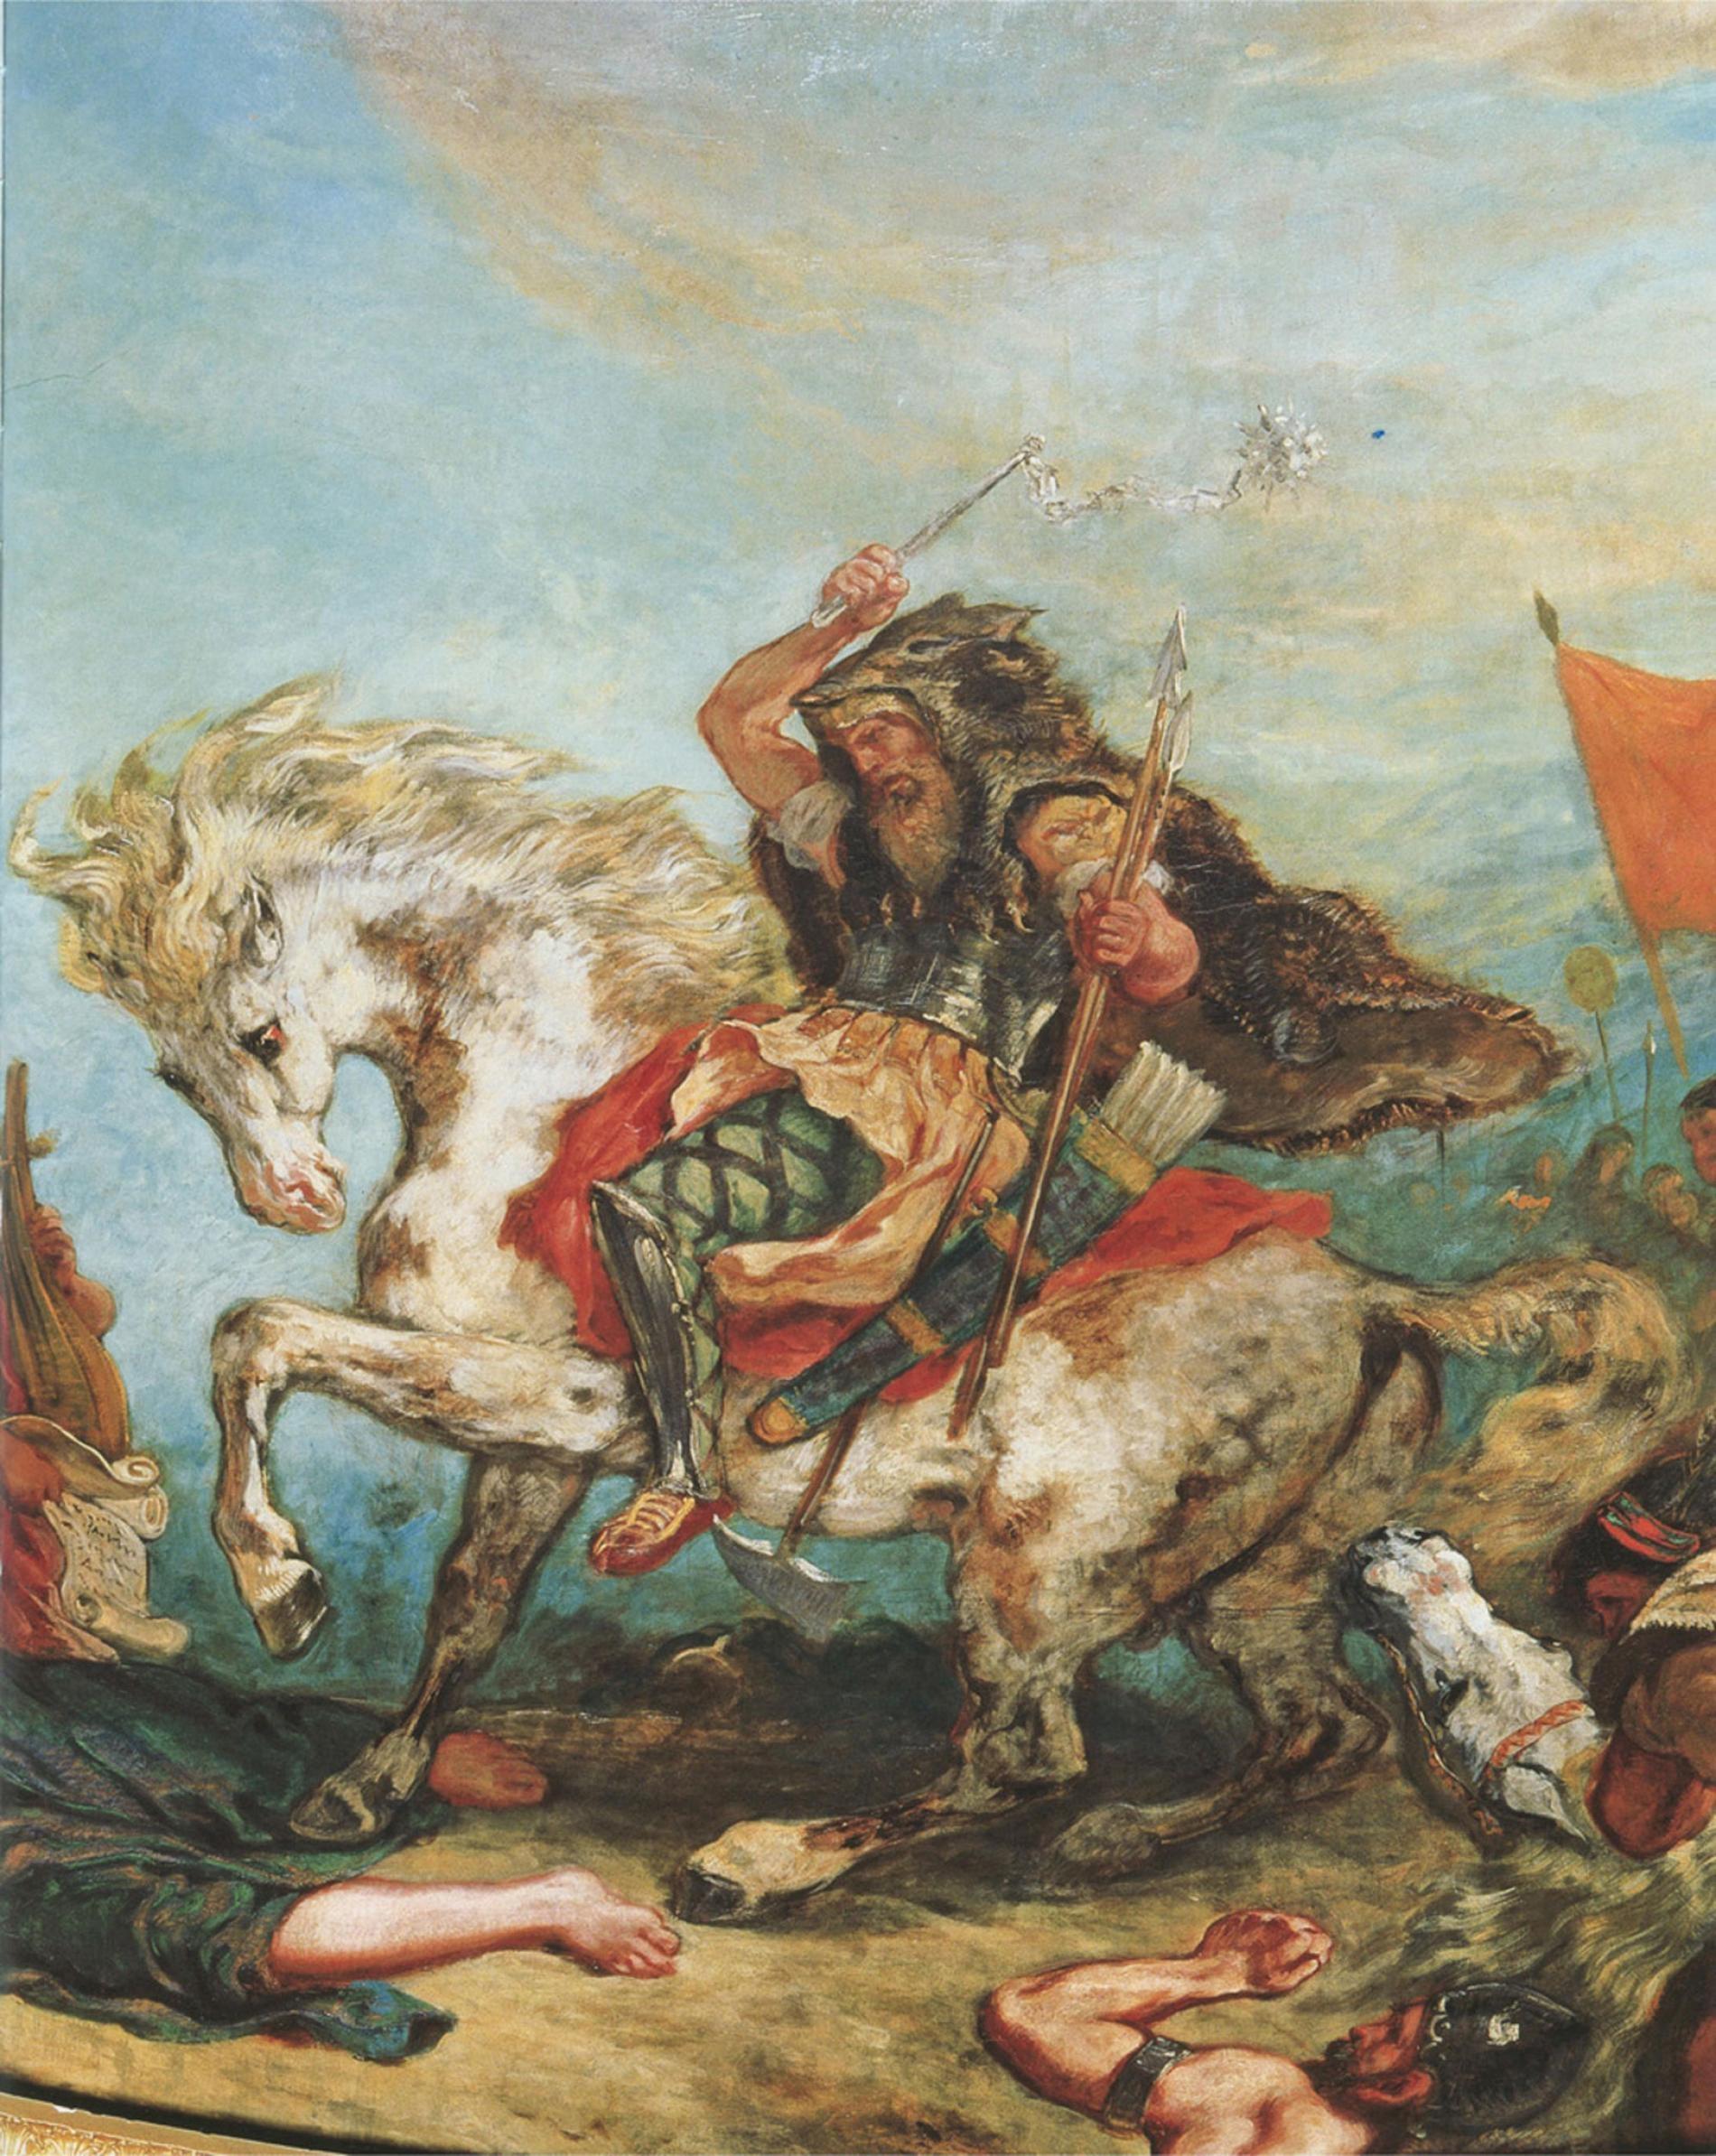 在法國畫家德拉克洛瓦(Eugene Delacroix)的畫作中,匈人阿提拉(Attila the Hun )與他的手下從馬背上攻擊敵人。PHOTOGRAPH BY THE PICTURE ART COLLECTION, ALAMY